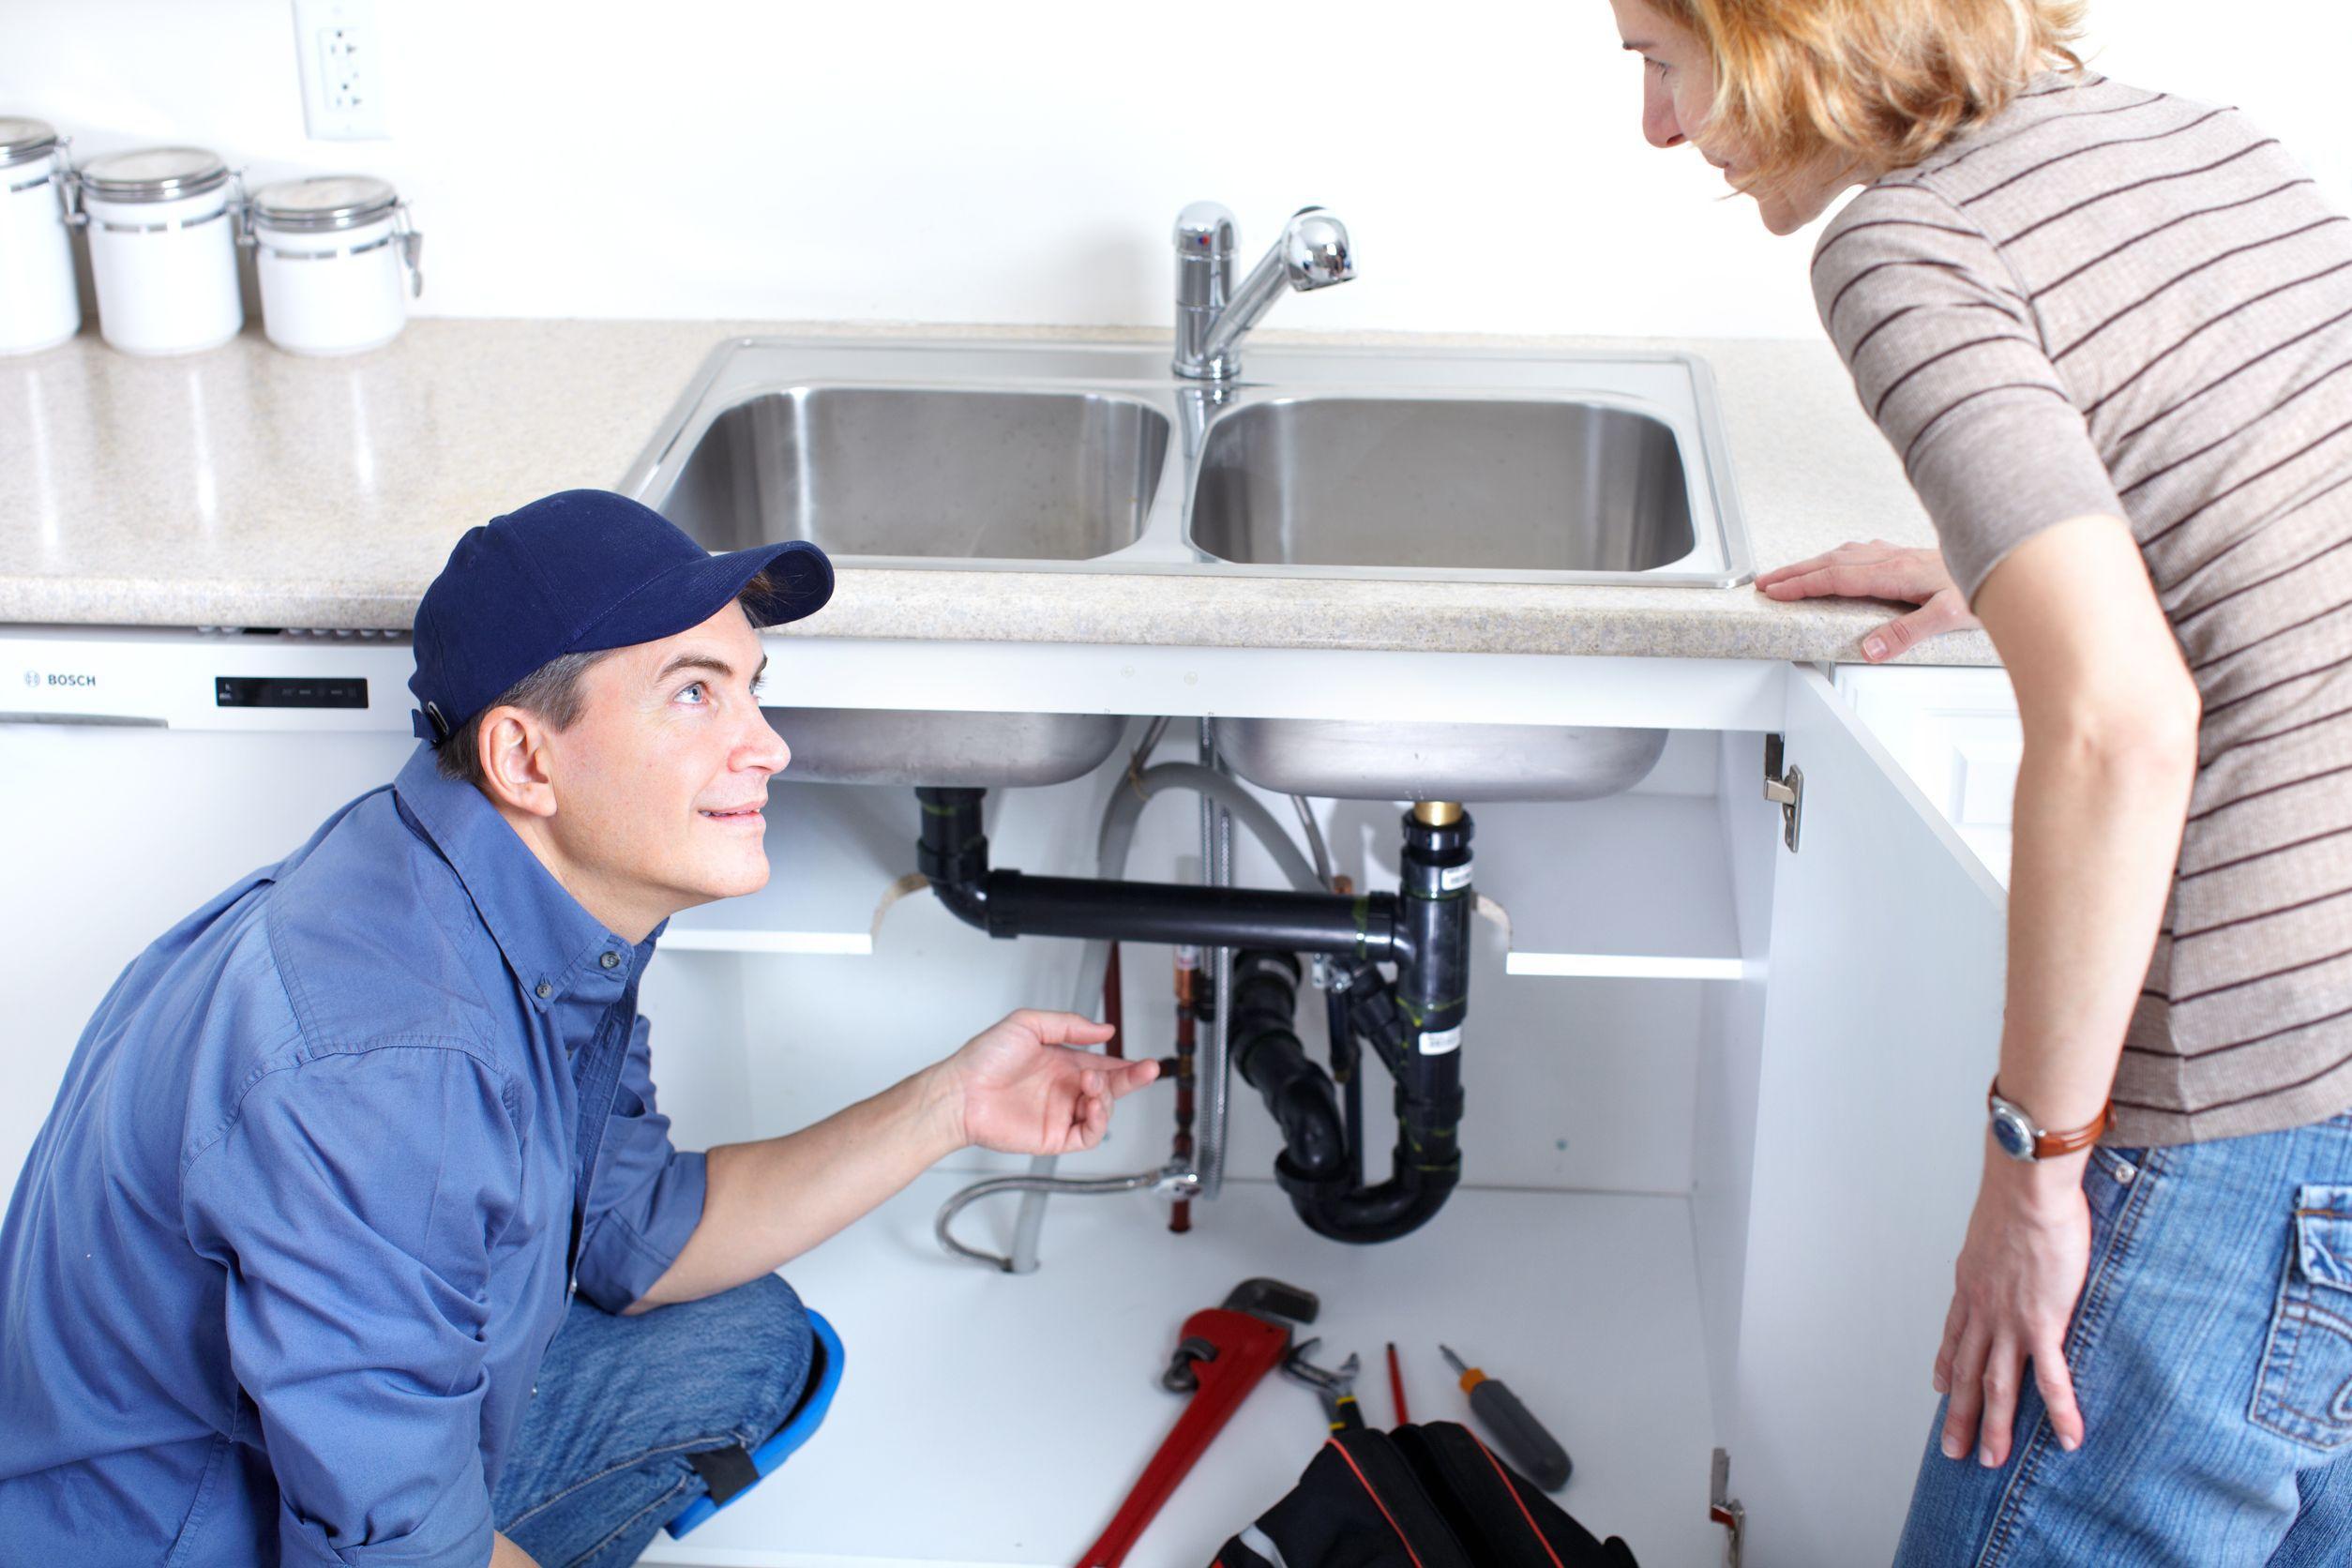 drain me west a near heater day same plumbing installation repair choice companies water plumbers kelowna